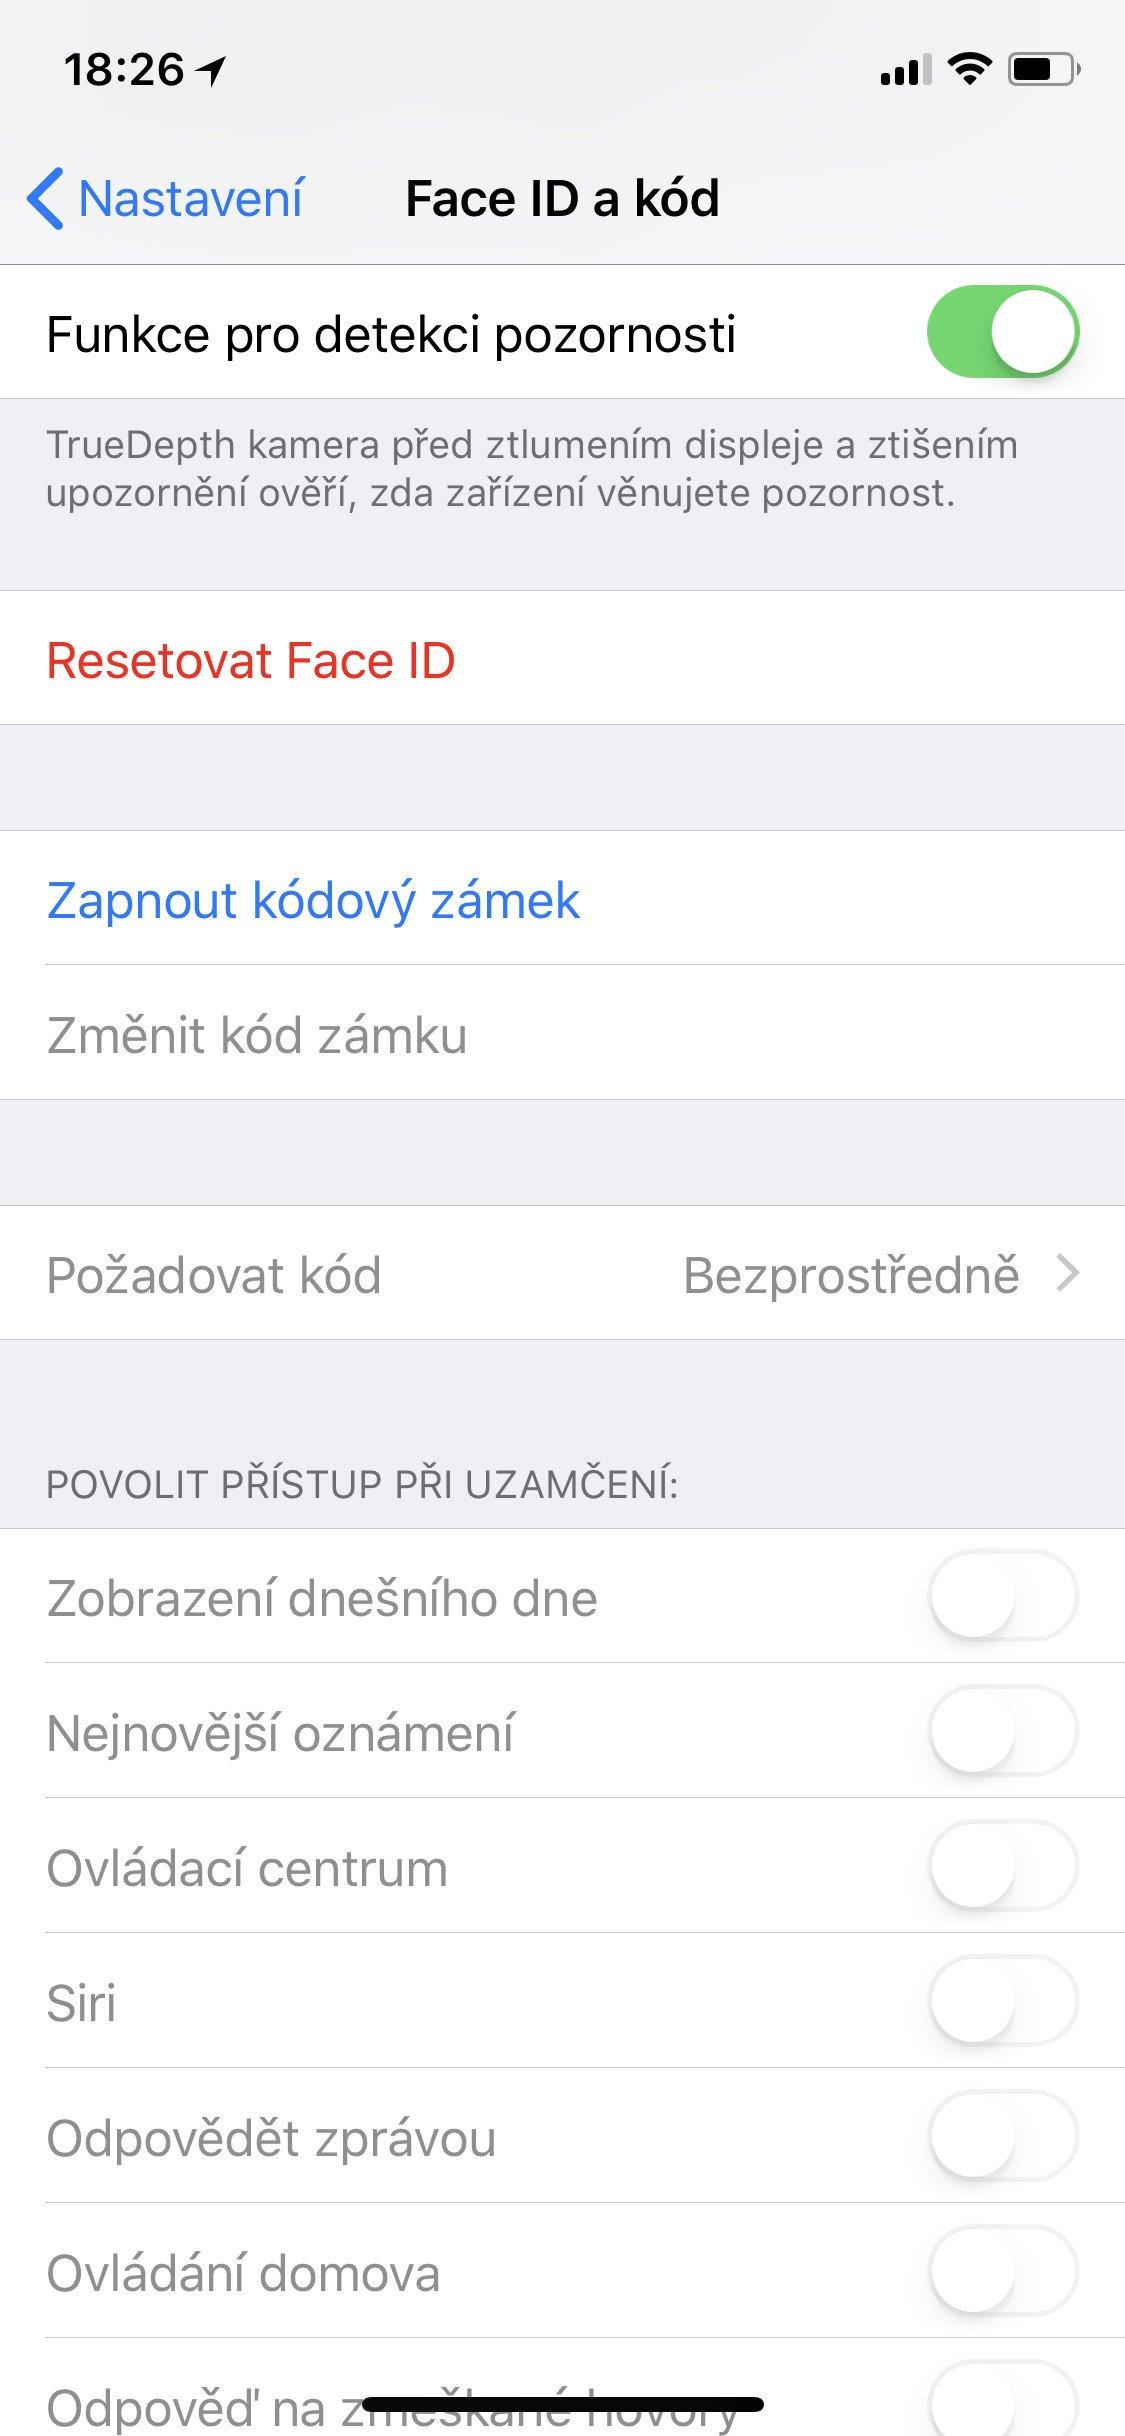 Obrazovka iOS Face ID a kód s vypnutým kódovým zámkem